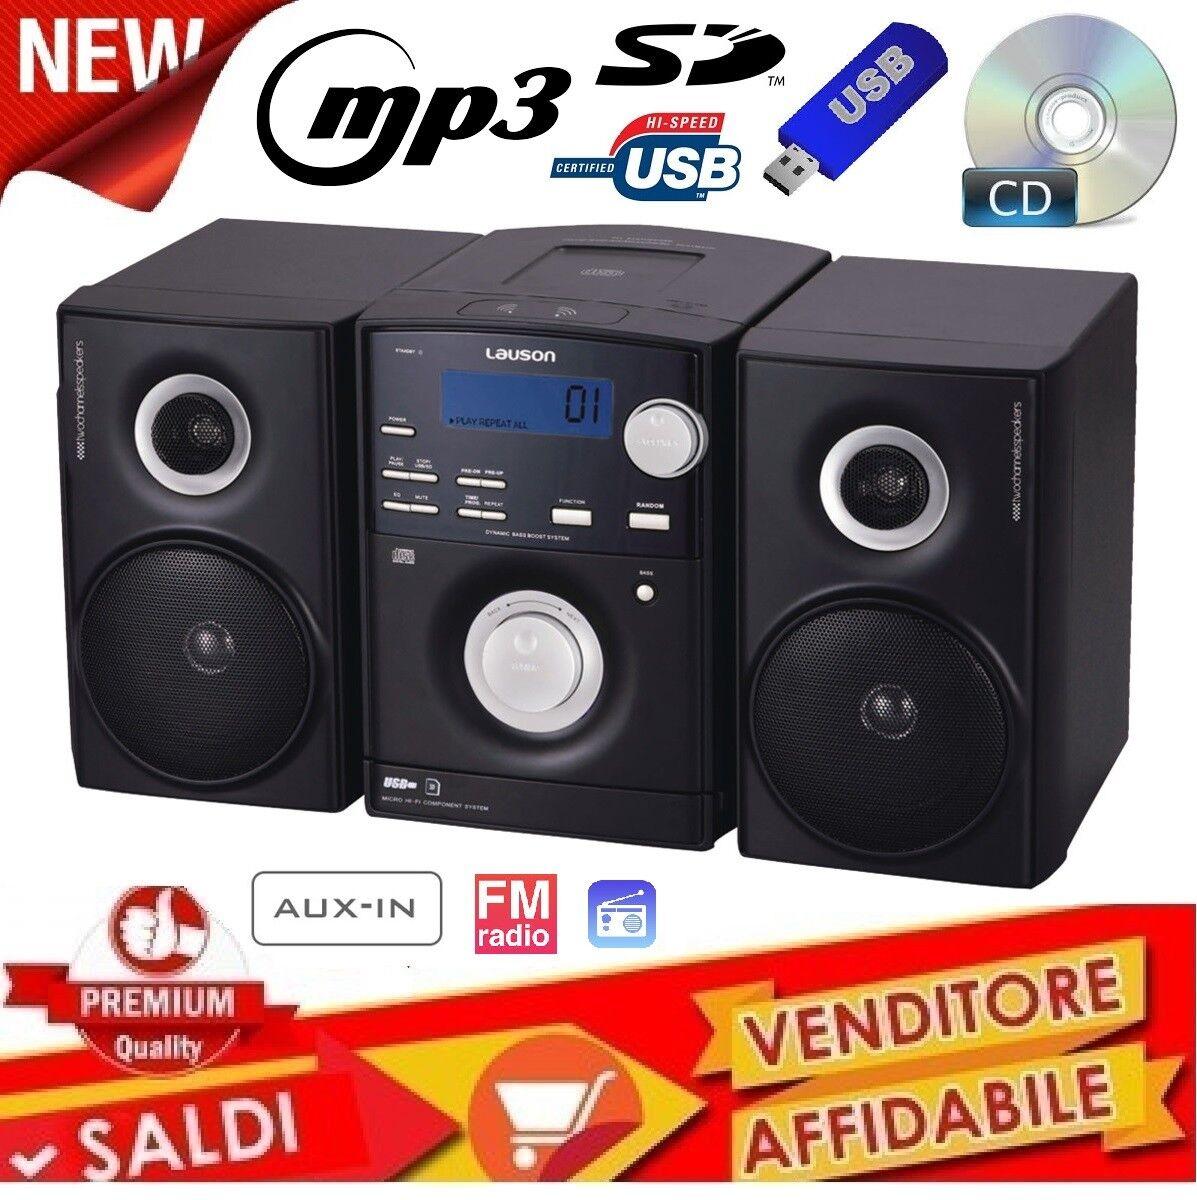 IMPIANTO STEREO HI FI CD MP3 RADIO FM USB SD AUX-IN  2 CASSE DISPLAY NERO 2018